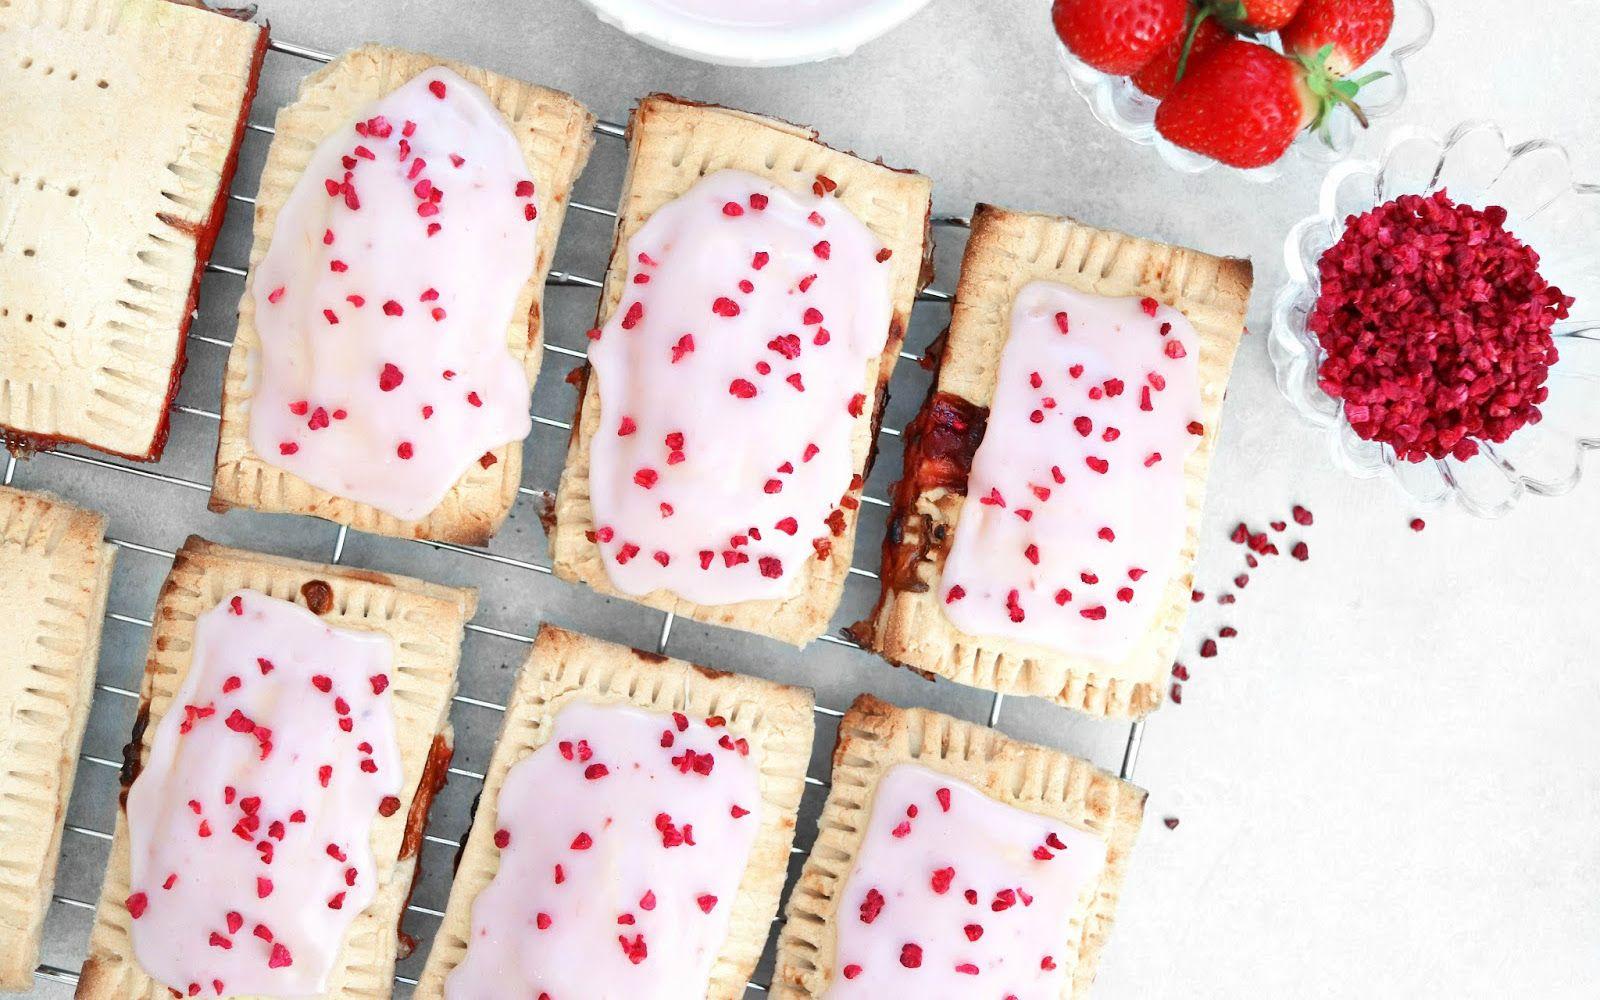 Strawberry Pop Tarts Vegan Gluten Free In 2020 Strawberry Pop